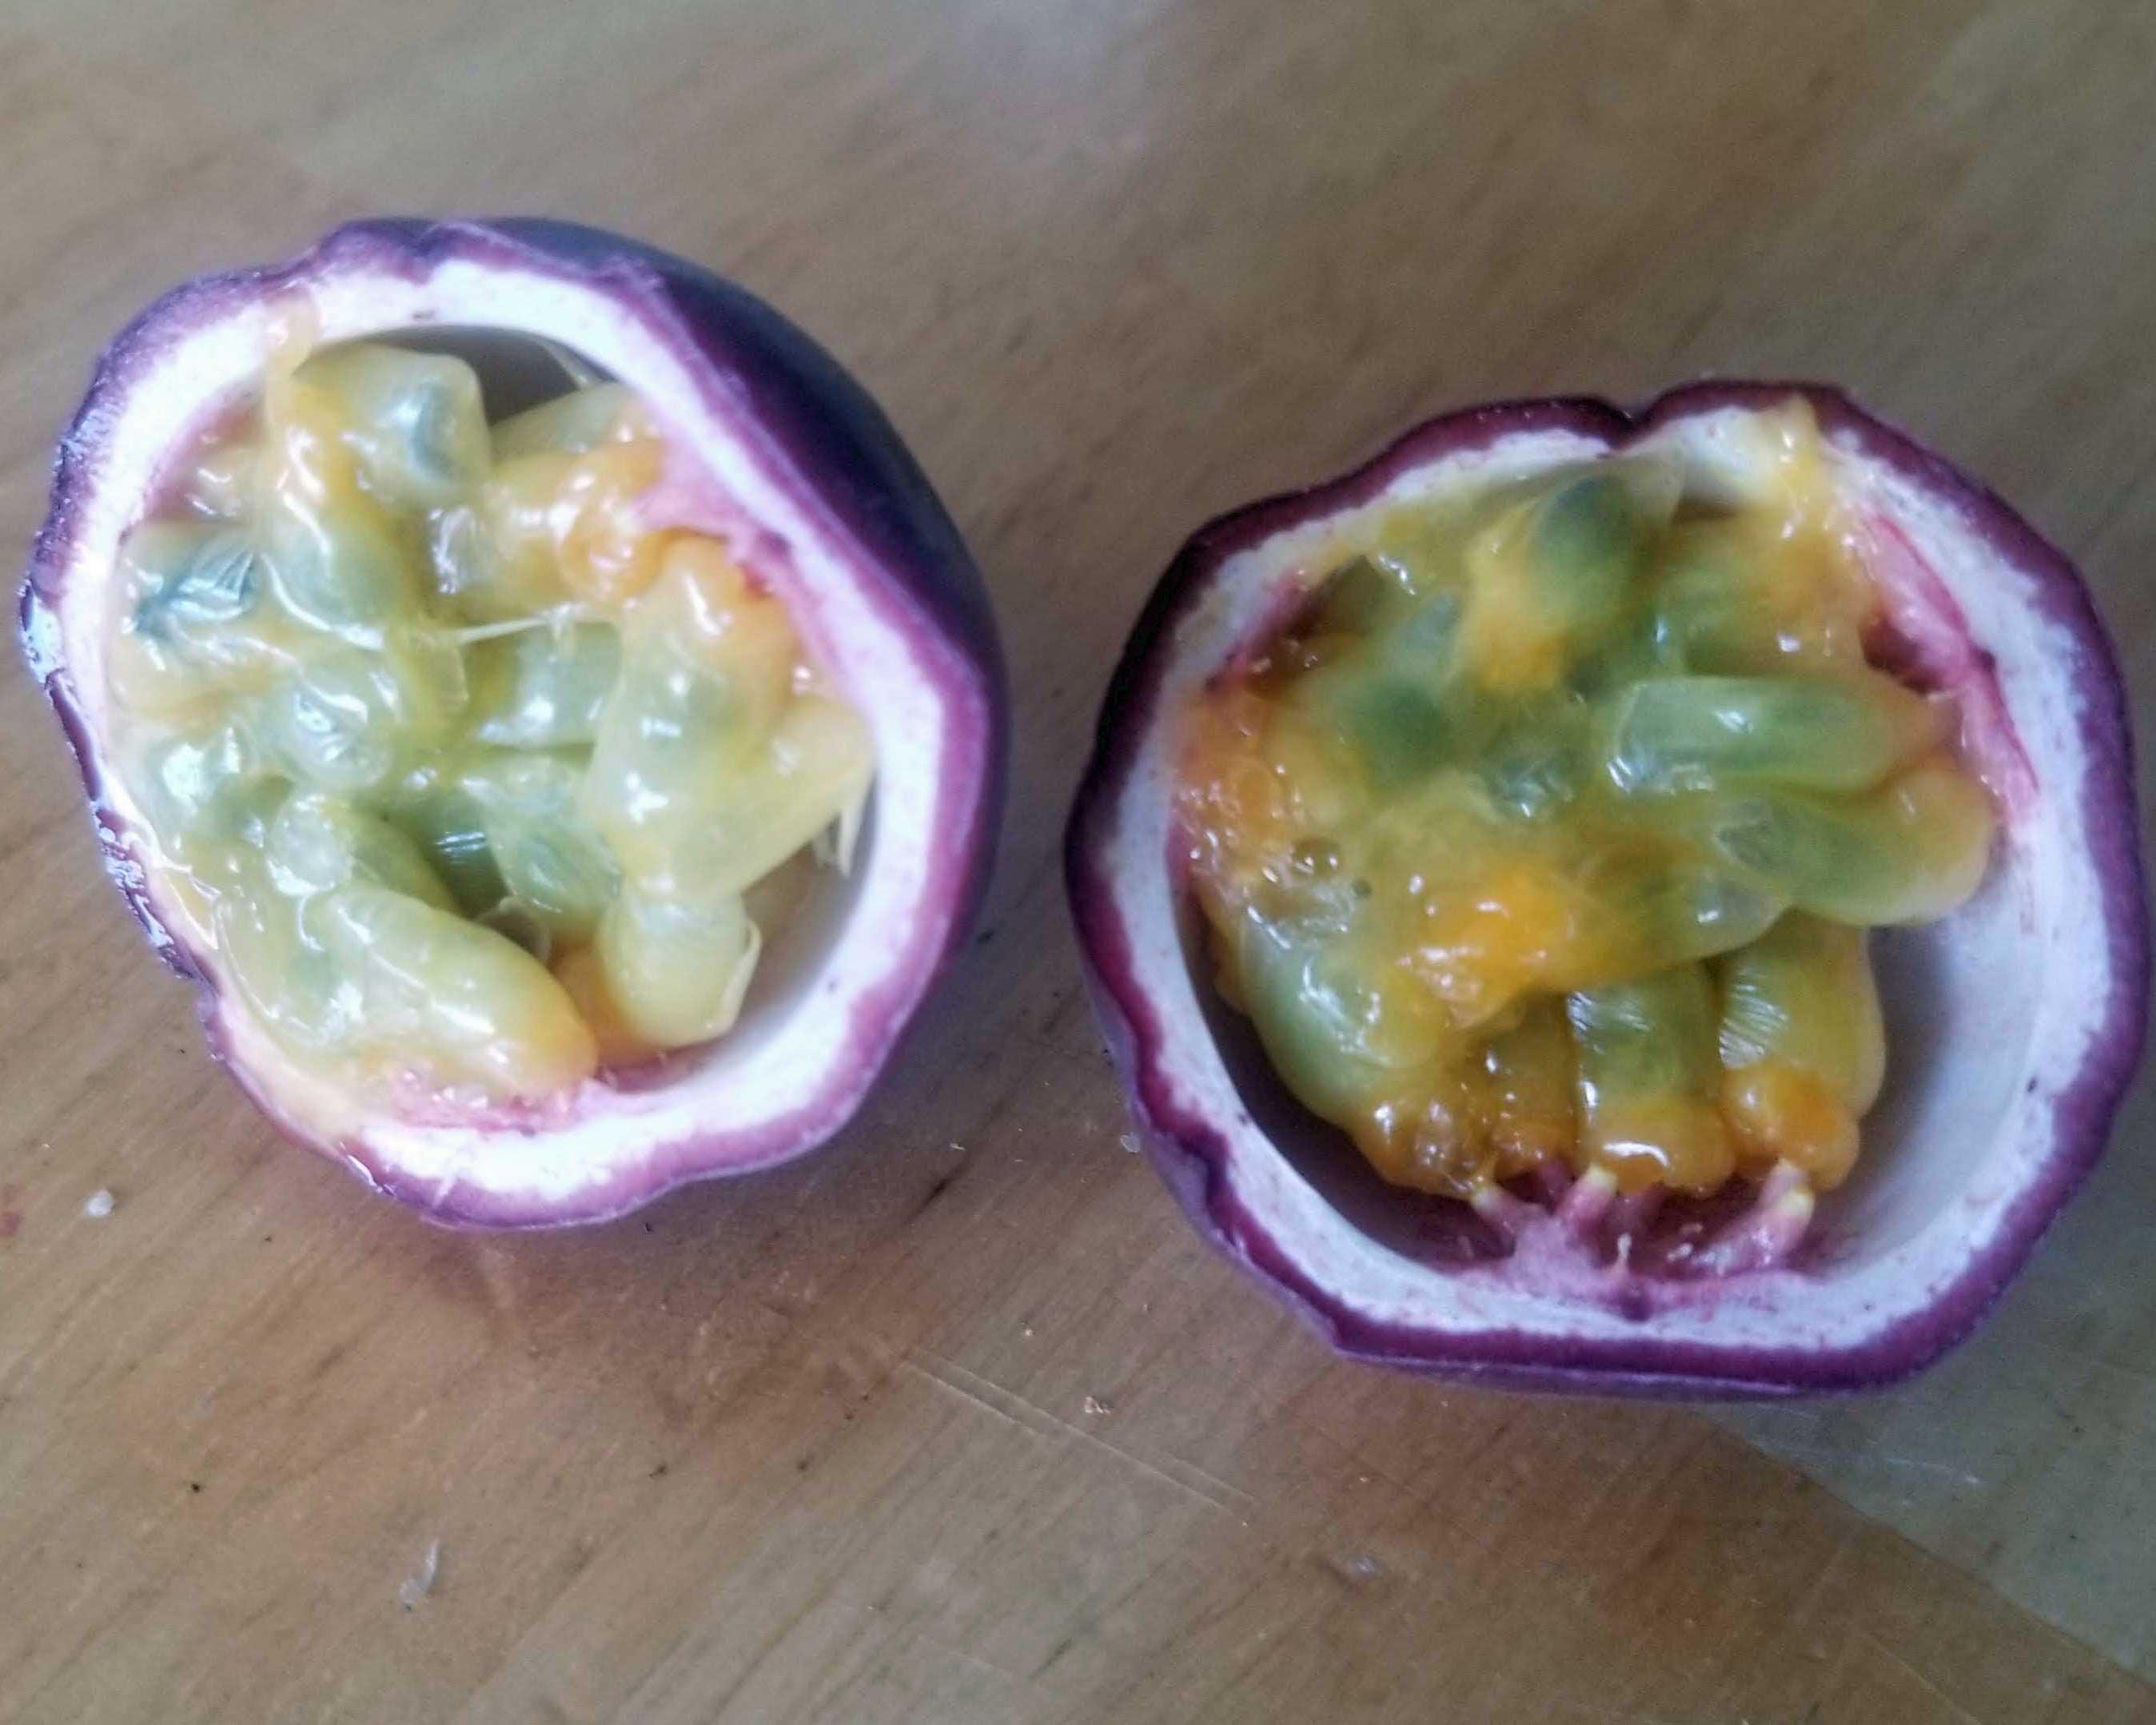 passionfruit-sliced